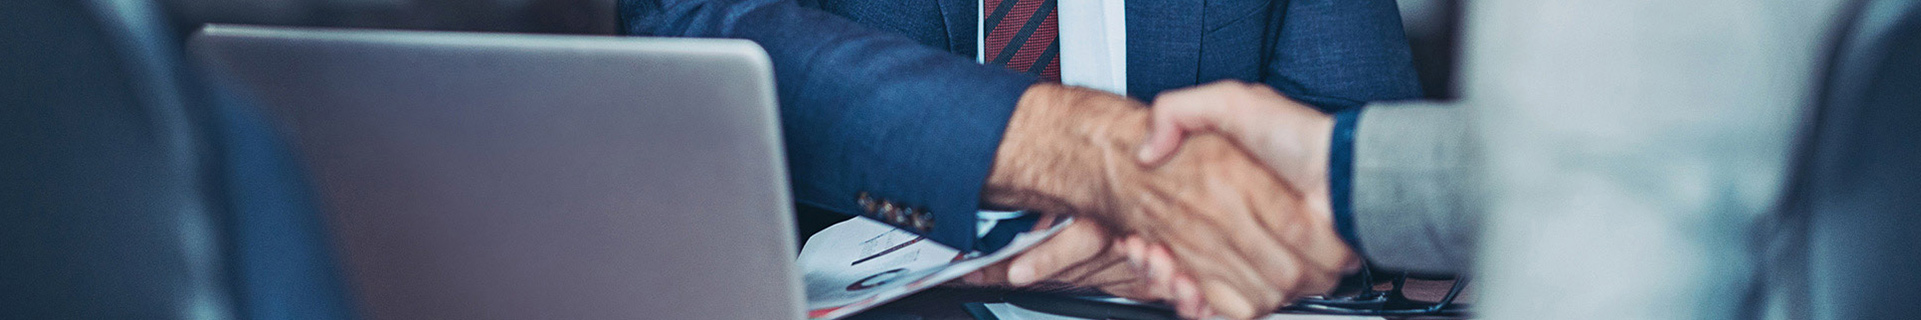 Banner Handschlag